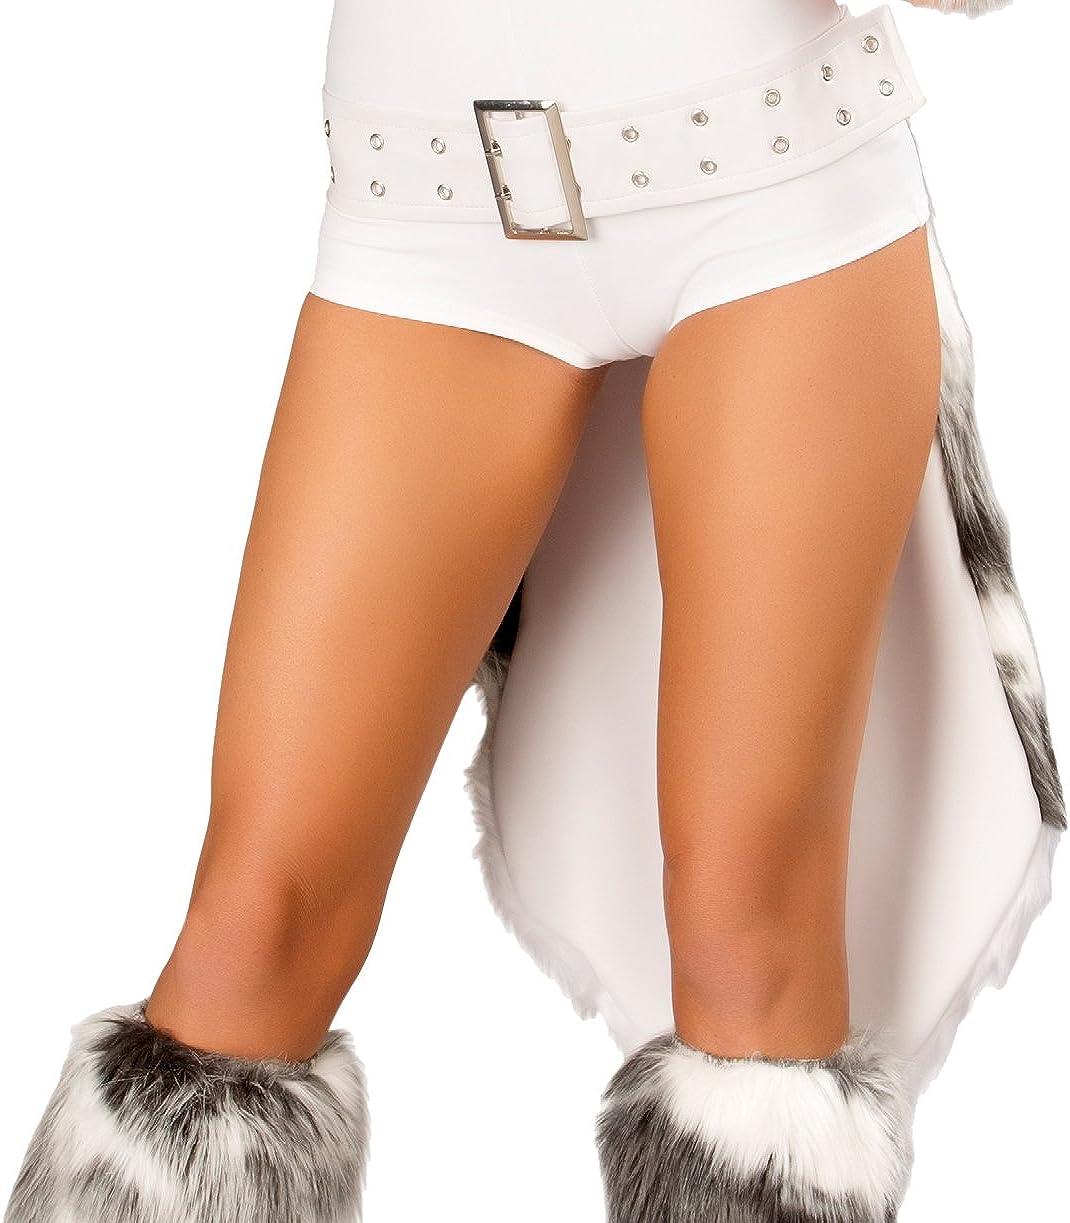 J. Valentine Women's Husky Belt with Tail